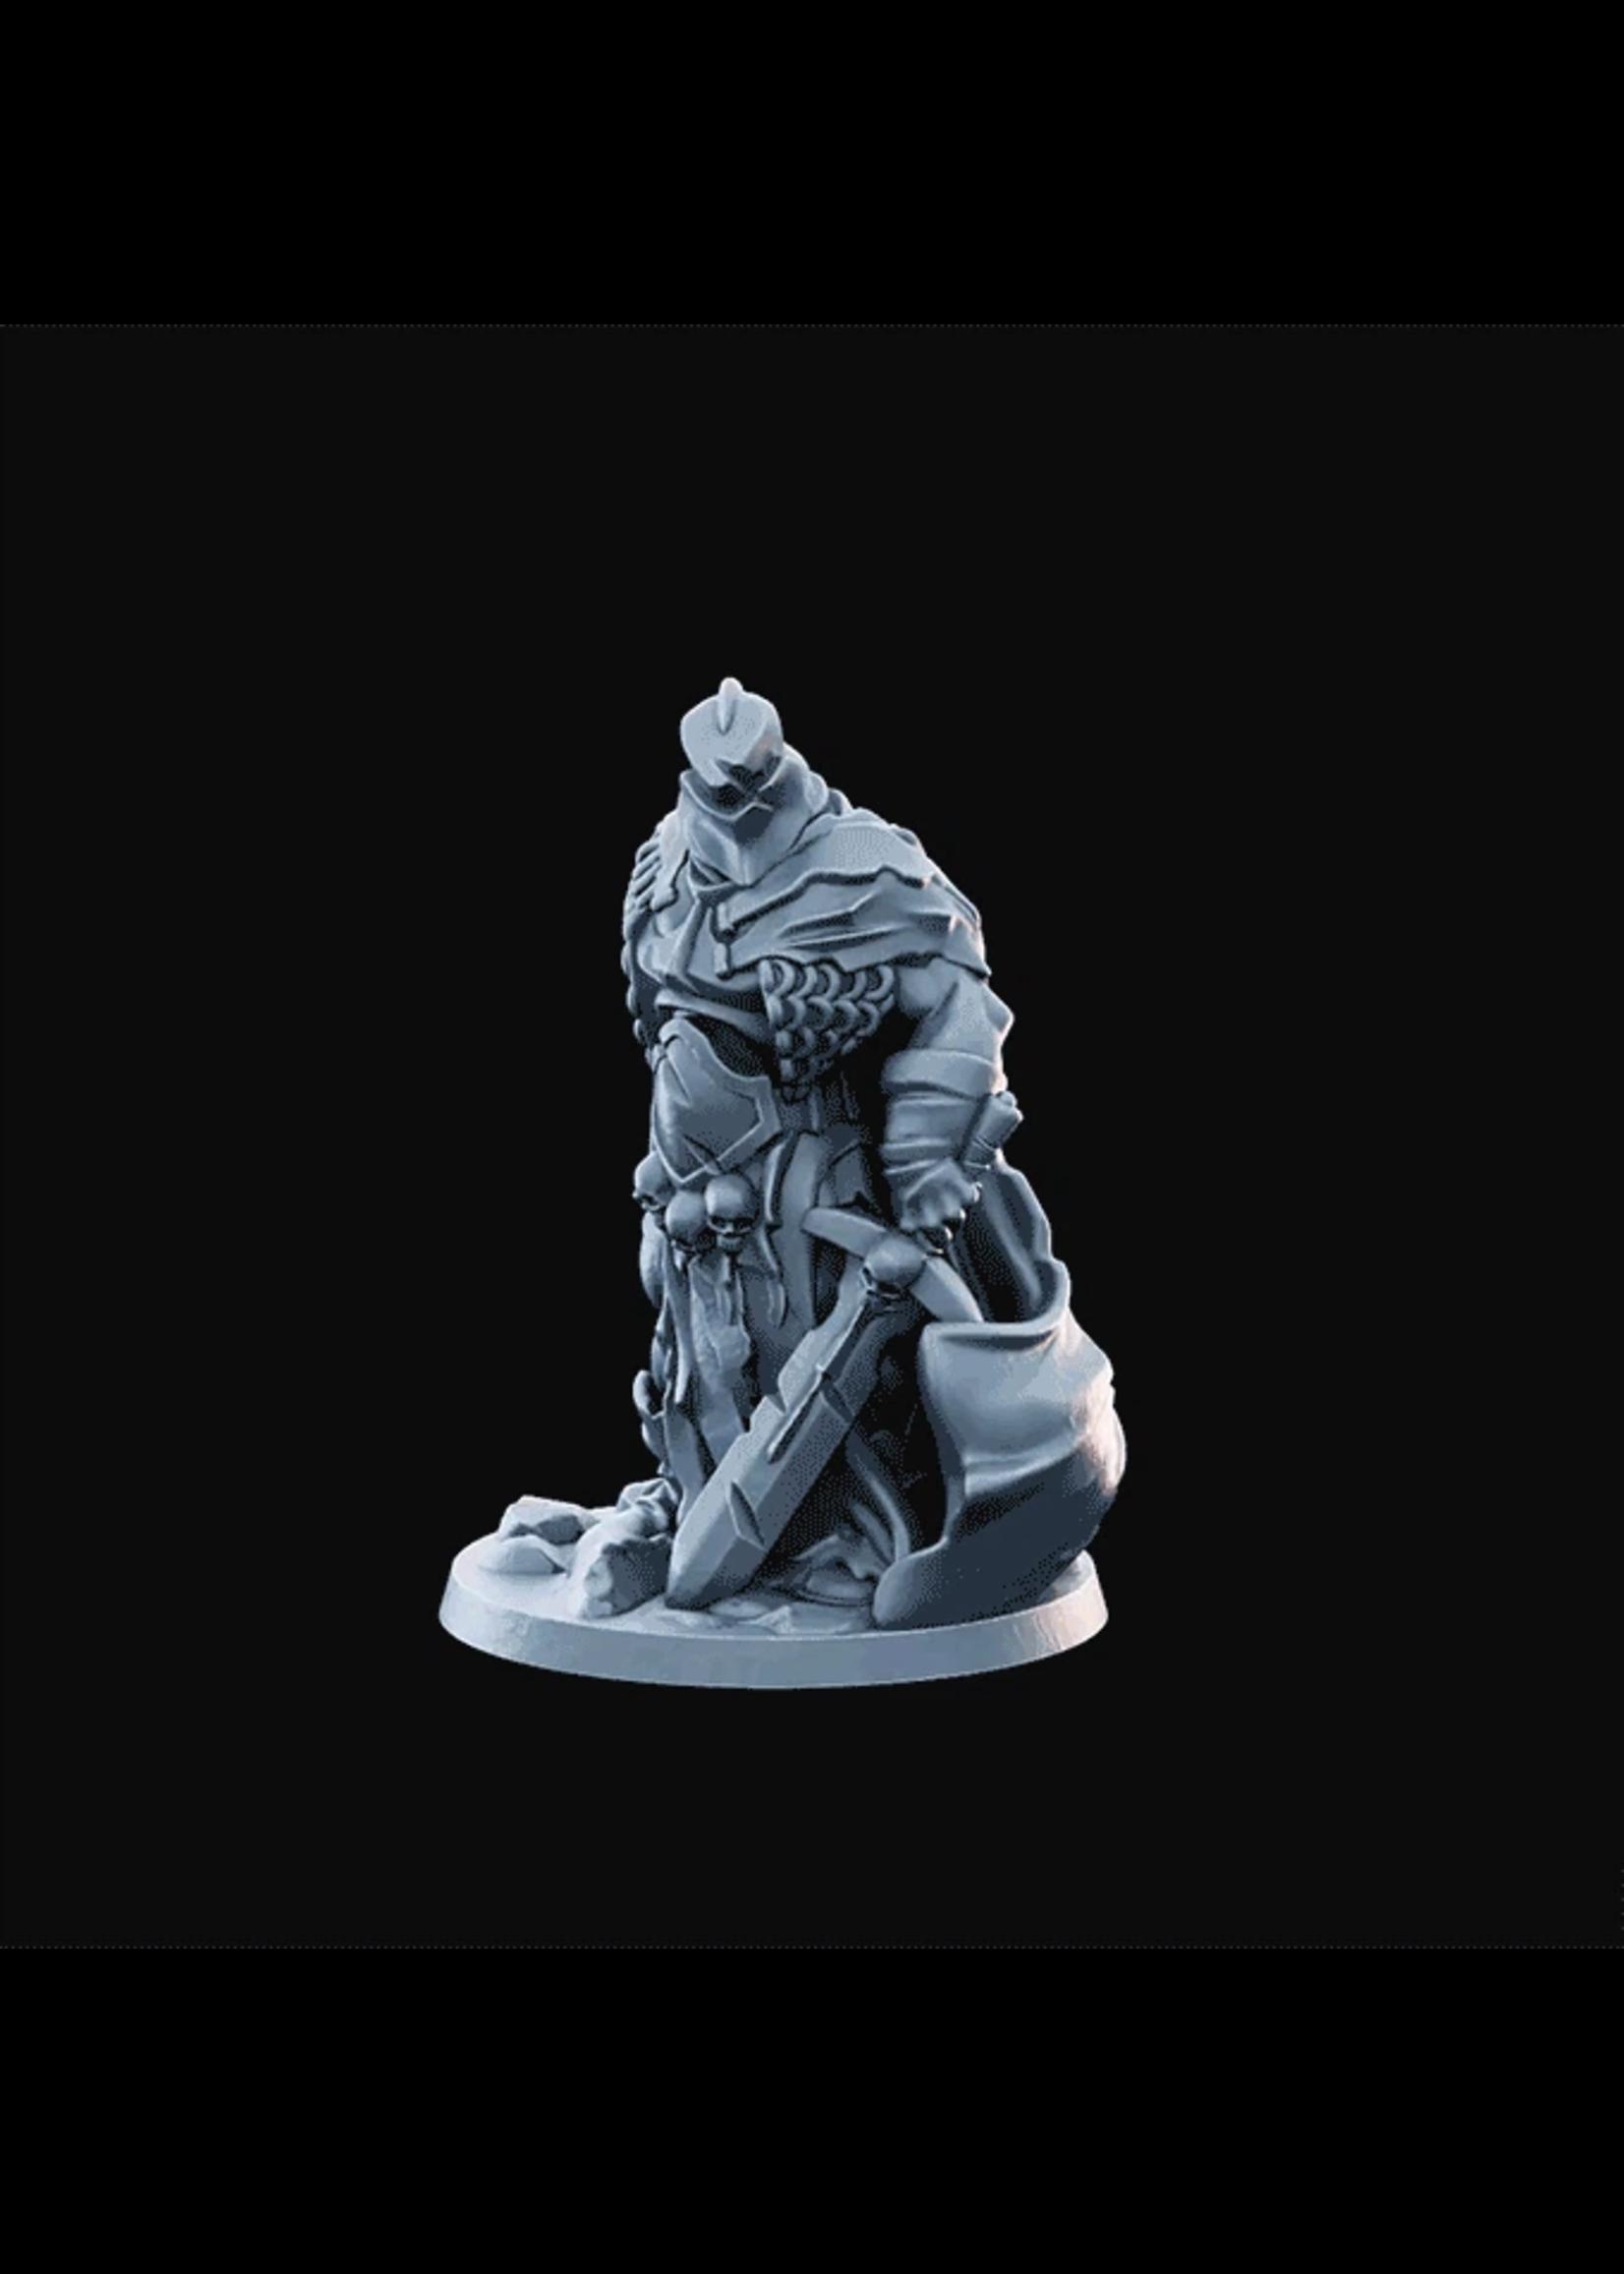 3D Printed Miniature - Fallen Knight  - Dungeons & Dragons - Desolate Plains KS